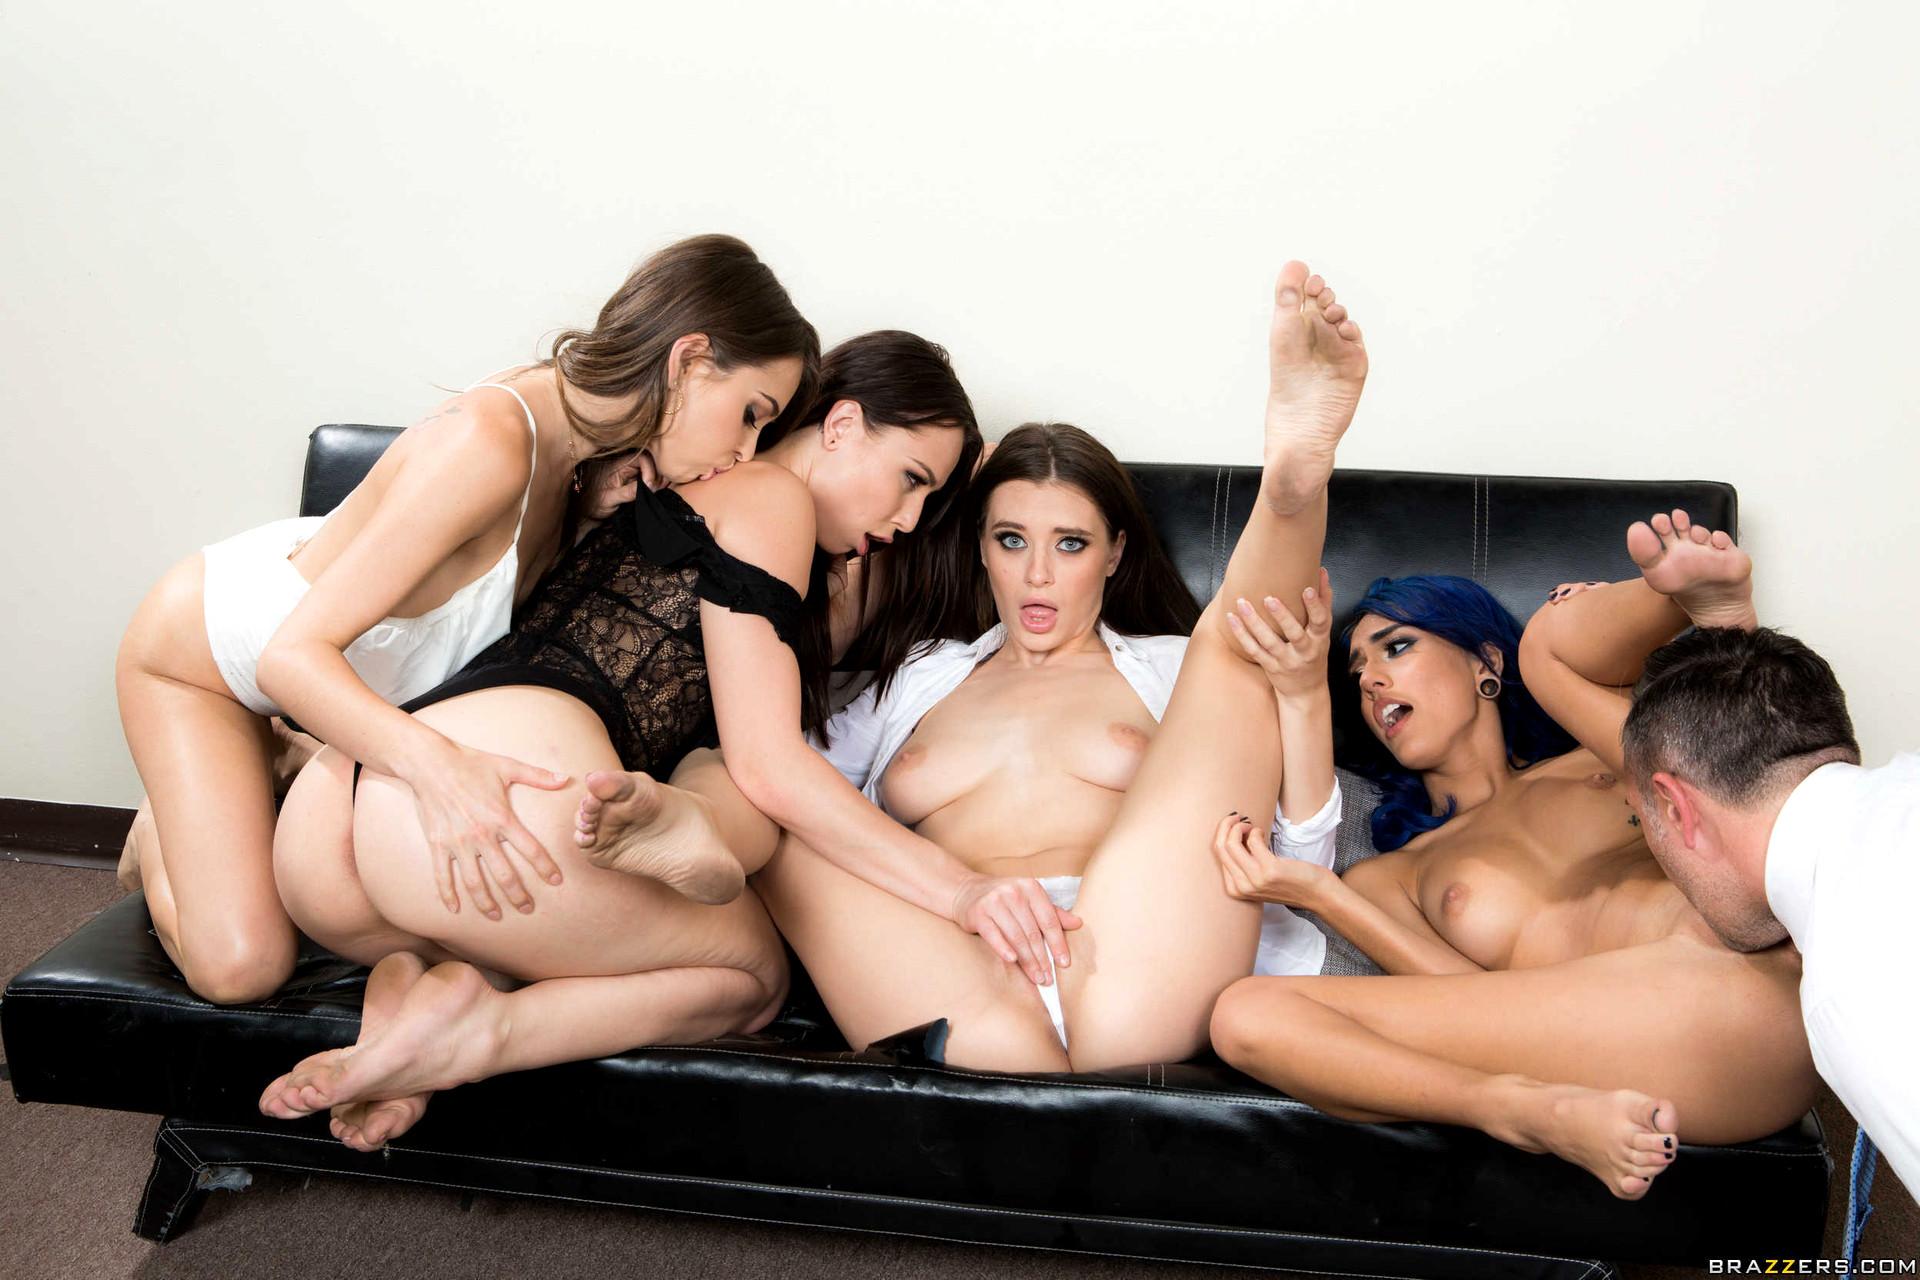 Free sex photos twistys kelly jessica twistys japanhdv dykes group orgy